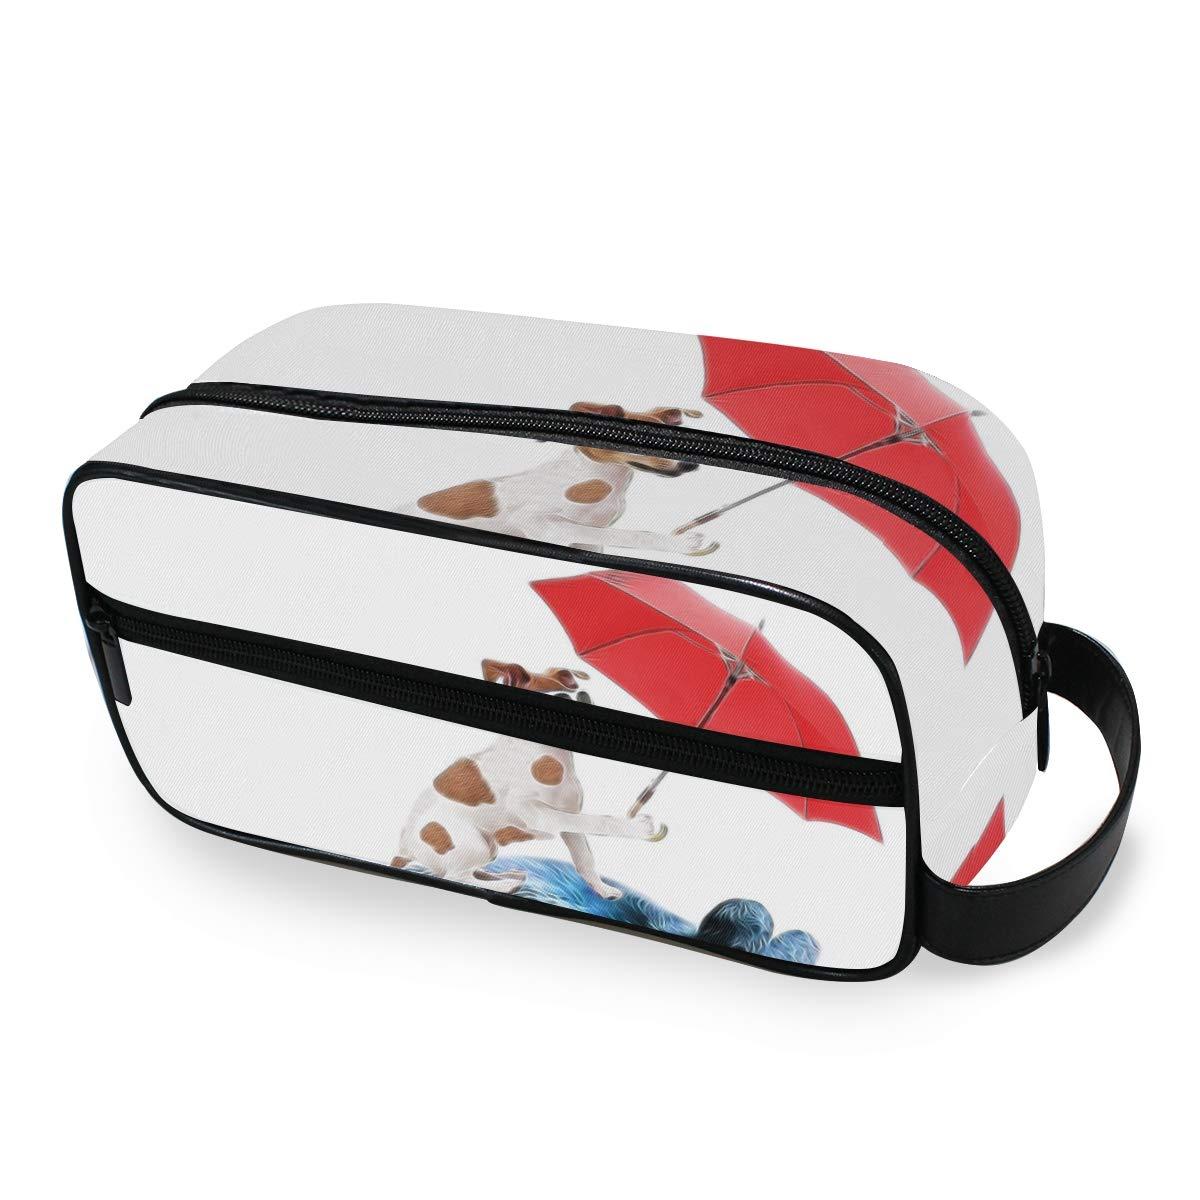 AKIOG Travel Cosmetic Bag Hanging Funny Dog Bear Bike Organizer Makeup Bags Professional Small Toiletry Bags Portable Storage Bag for Kids Women.